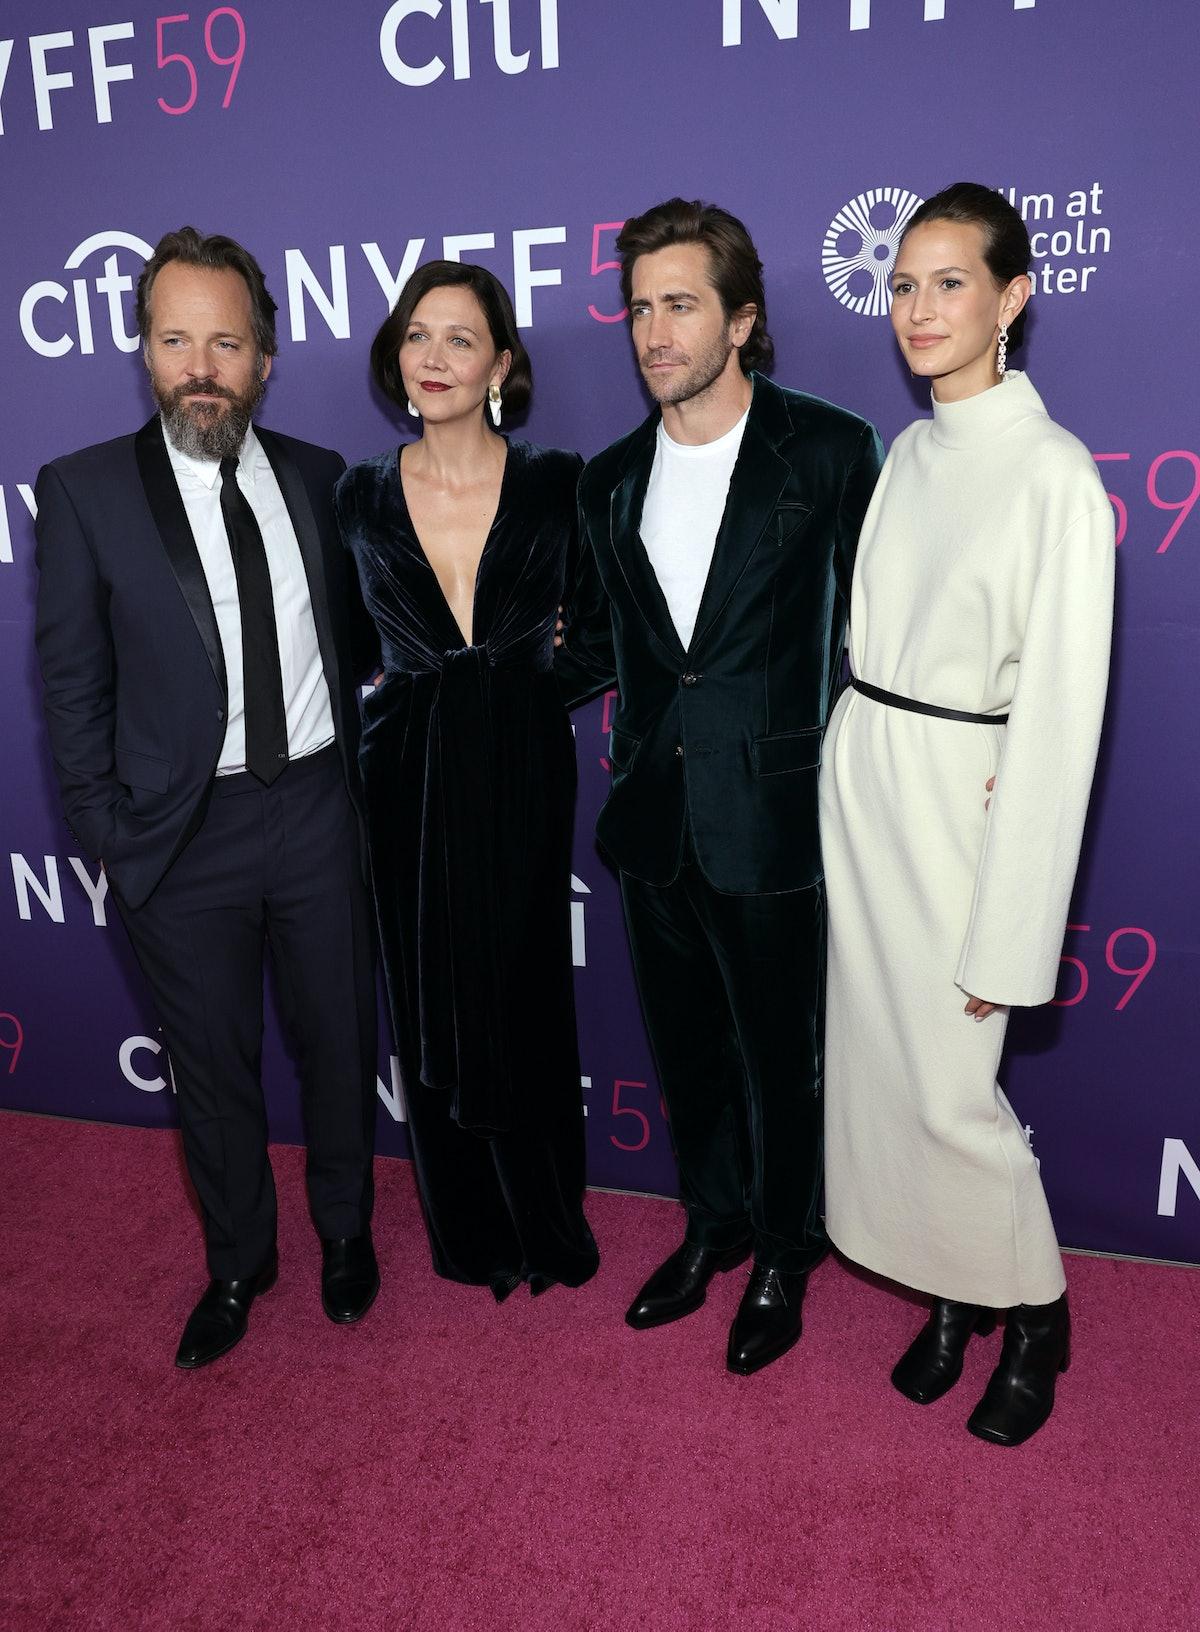 نیویورک ، نیویورک - 29 سپتامبر: (LR) پیتر سارسگارد ، مگی جیلنهال ، جیک جیلنهال و جیا ...